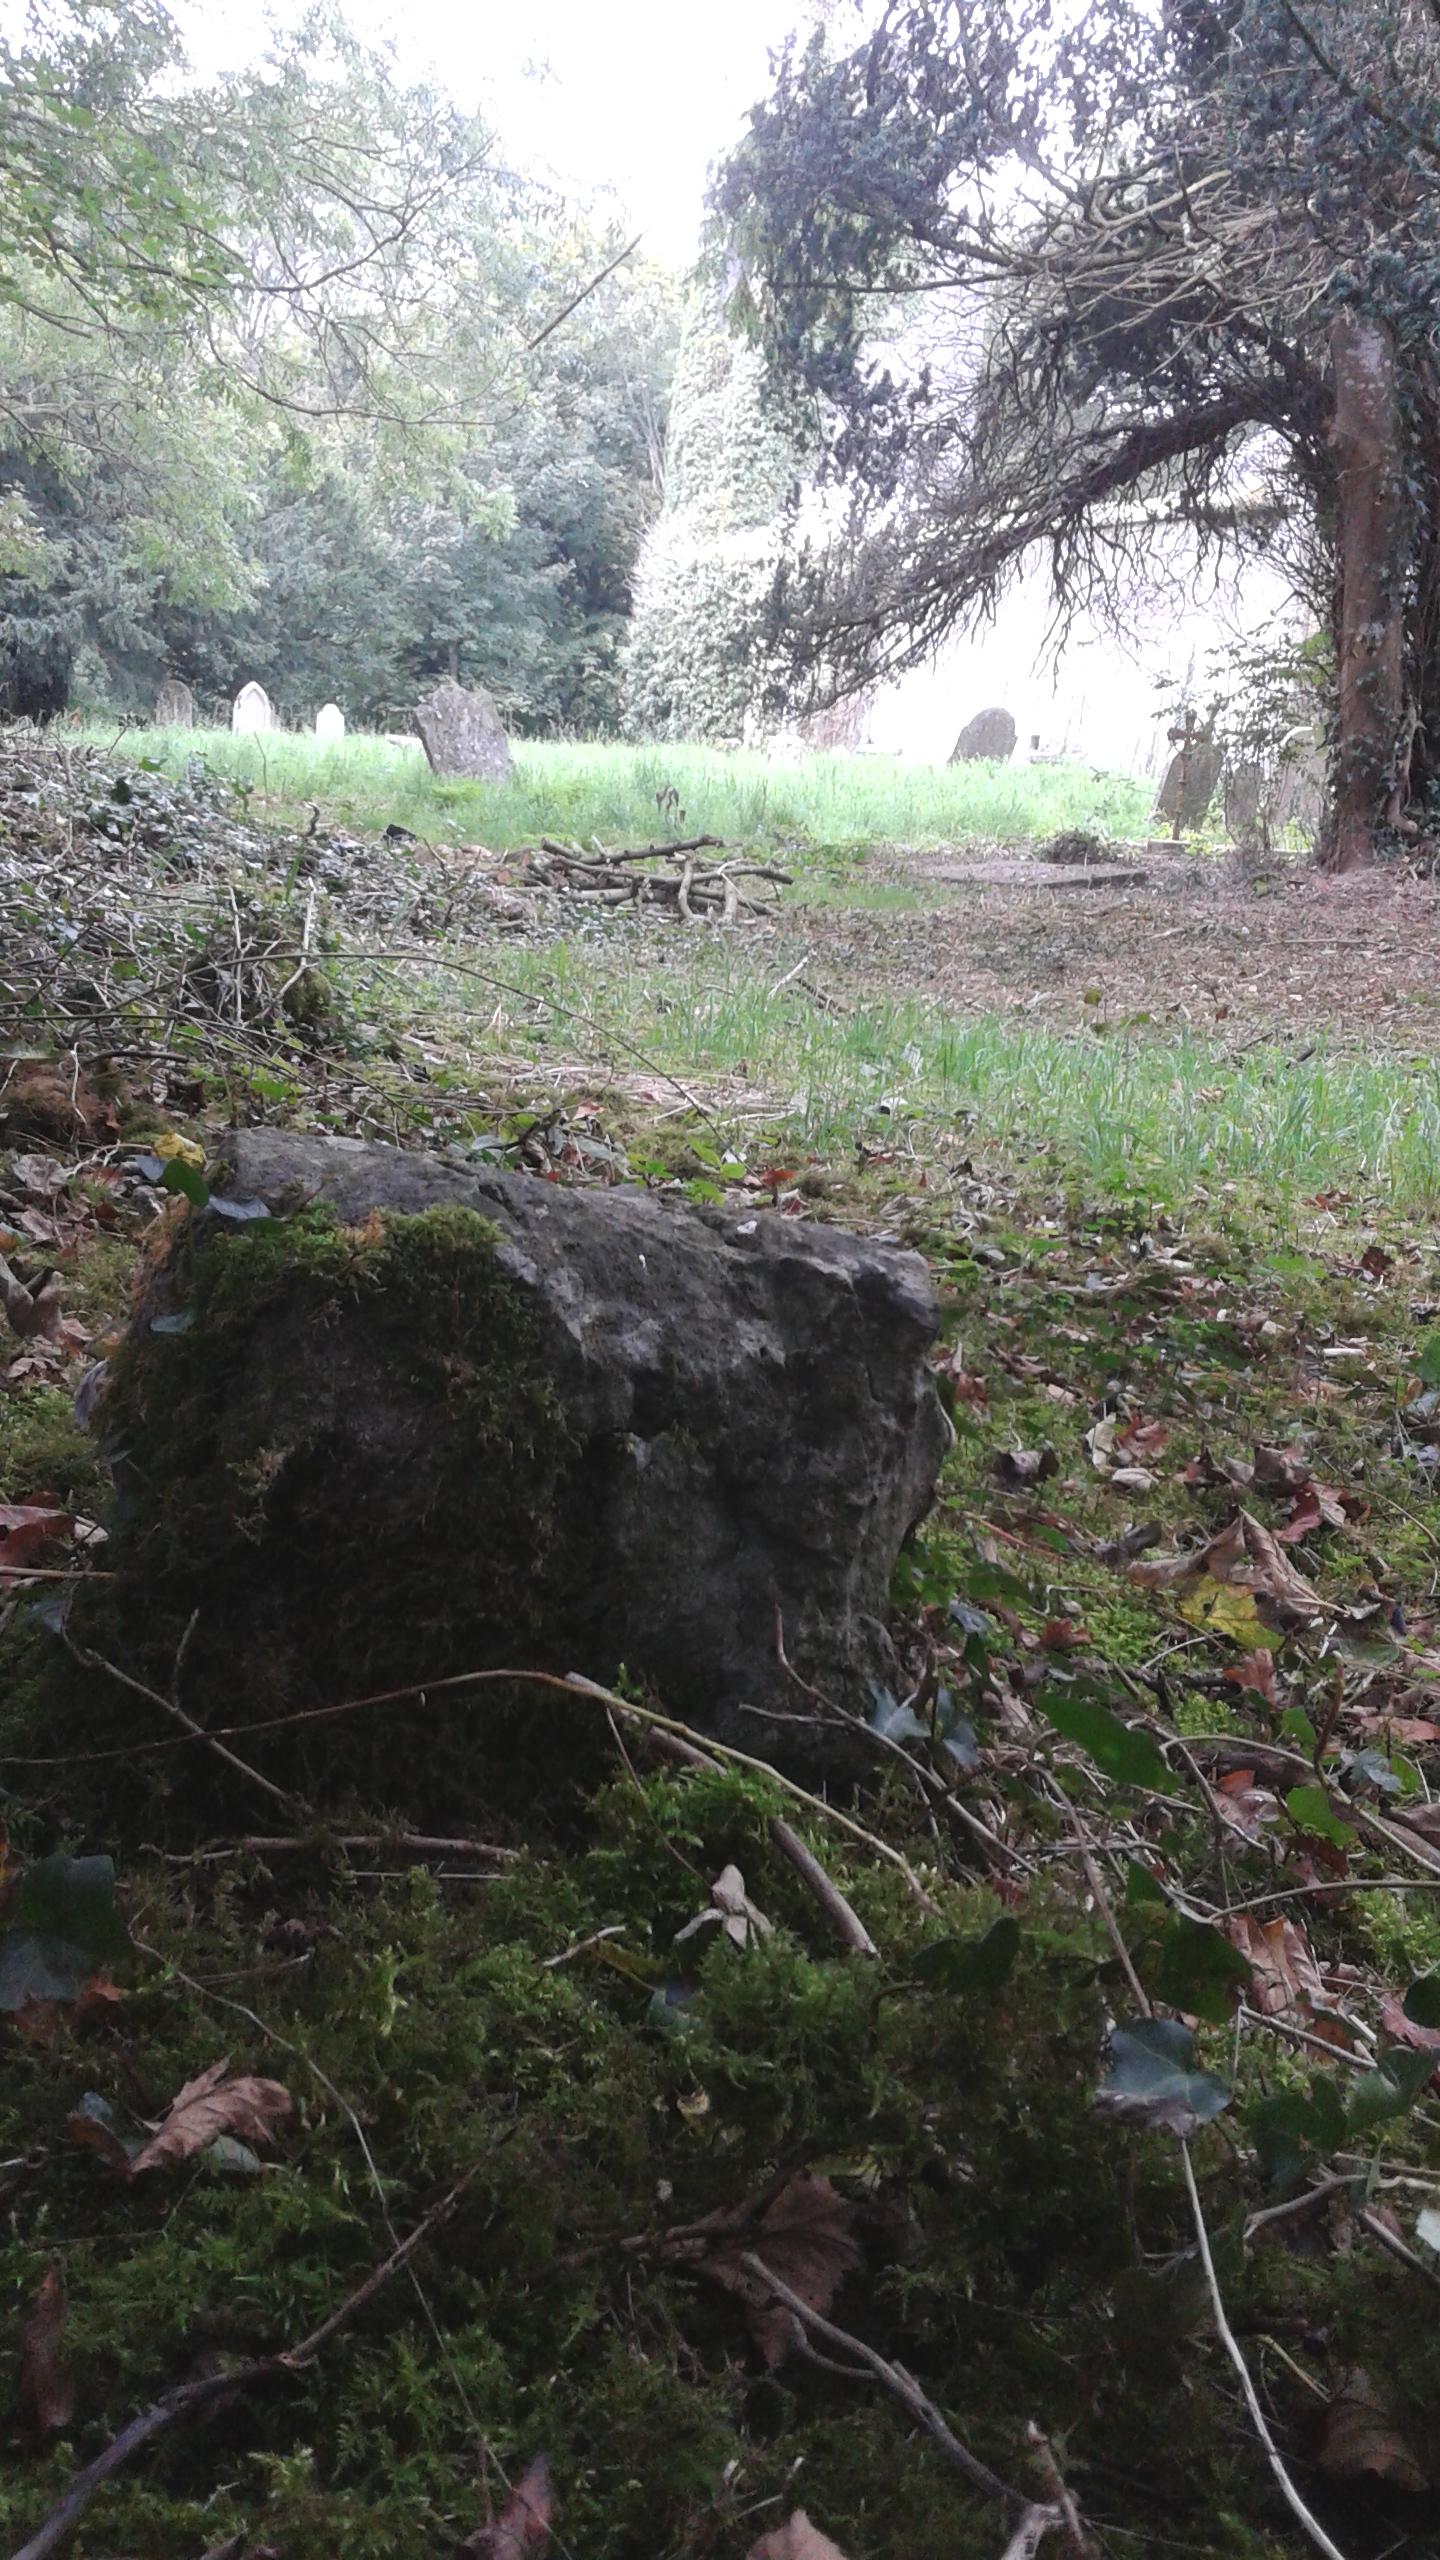 Toe Stone in Finnoe Graveyard